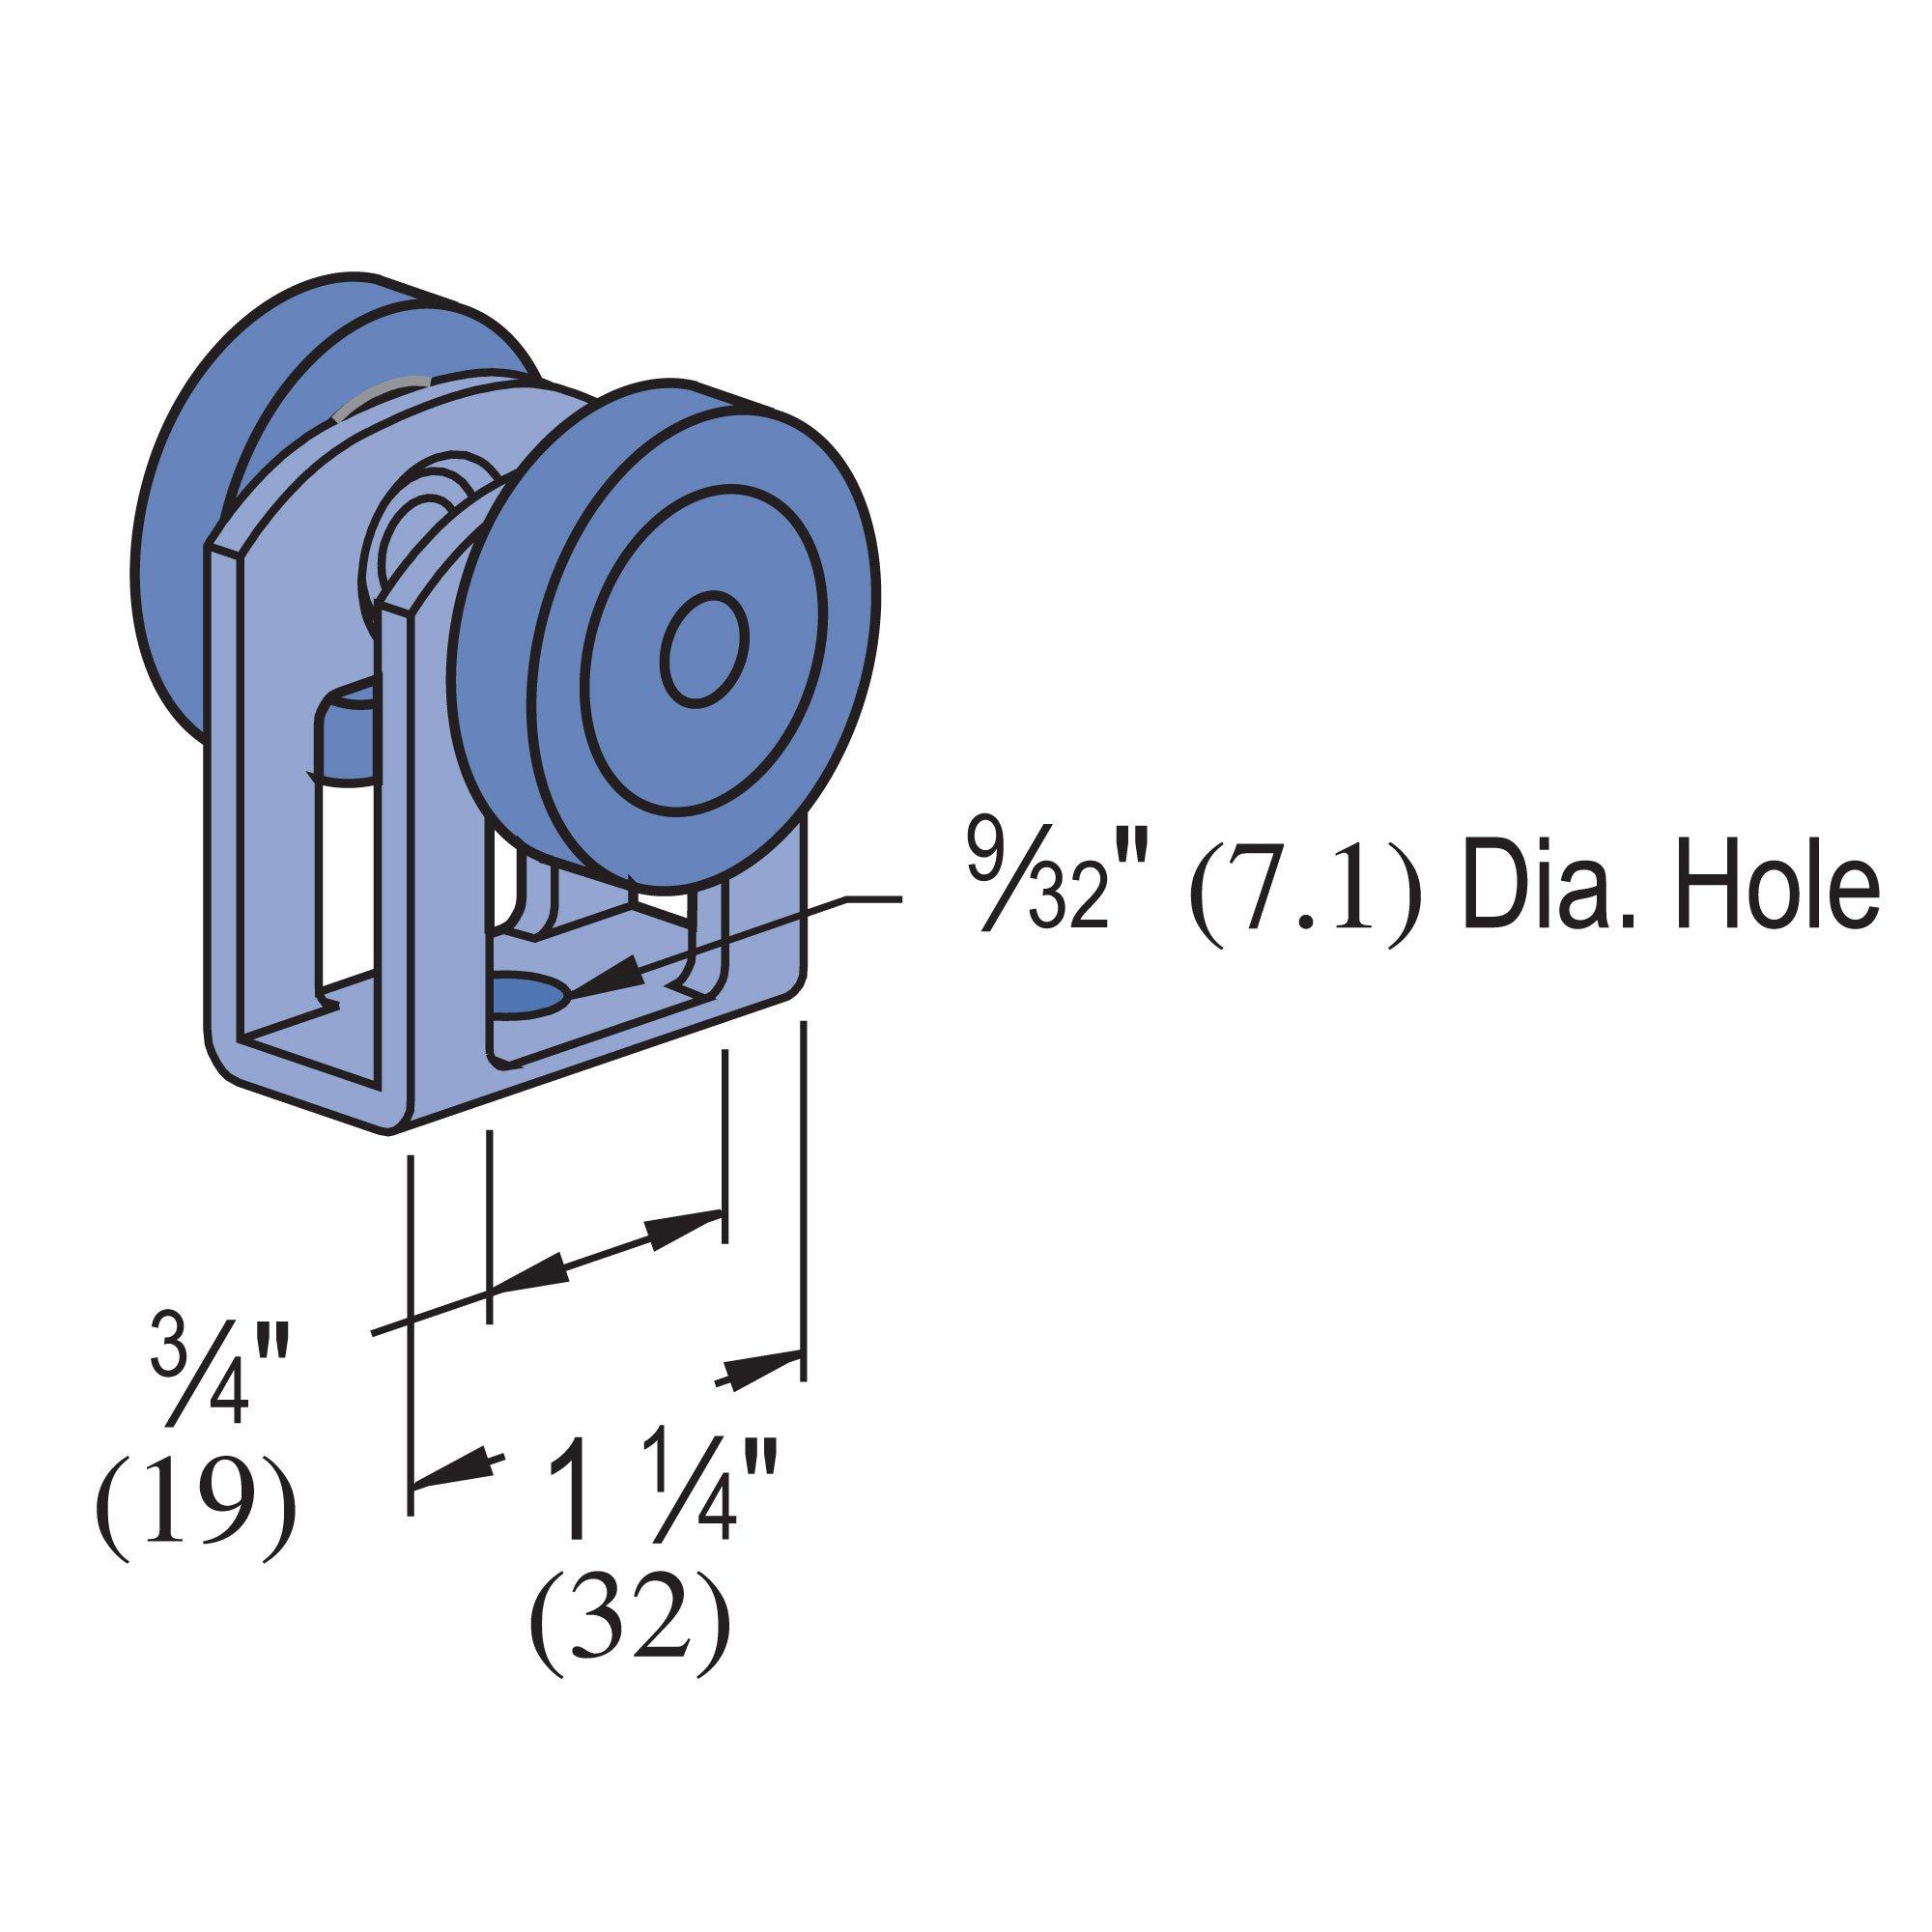 Genuine Unistrut P2749N EG Nylon Wheel Trolley - 2 Wheel Unistrut Trolley Support, 10 Lb Max Load by UNISTRUT (Image #1)